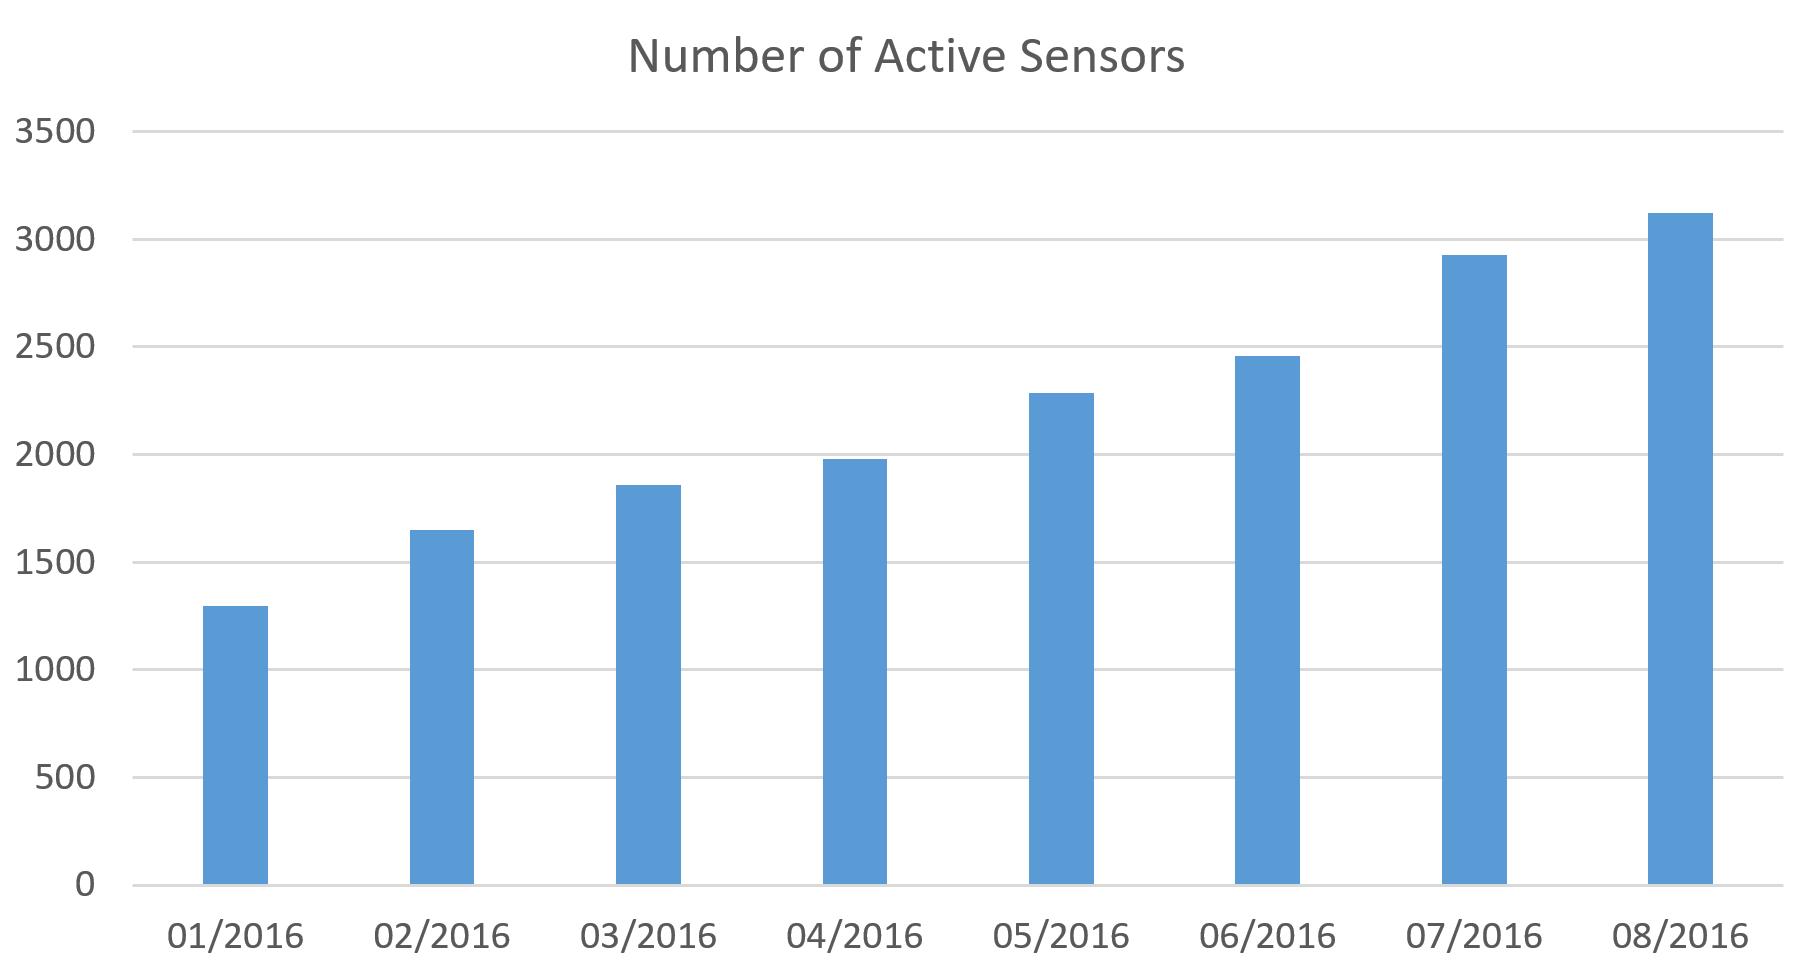 Active ADSB sensors